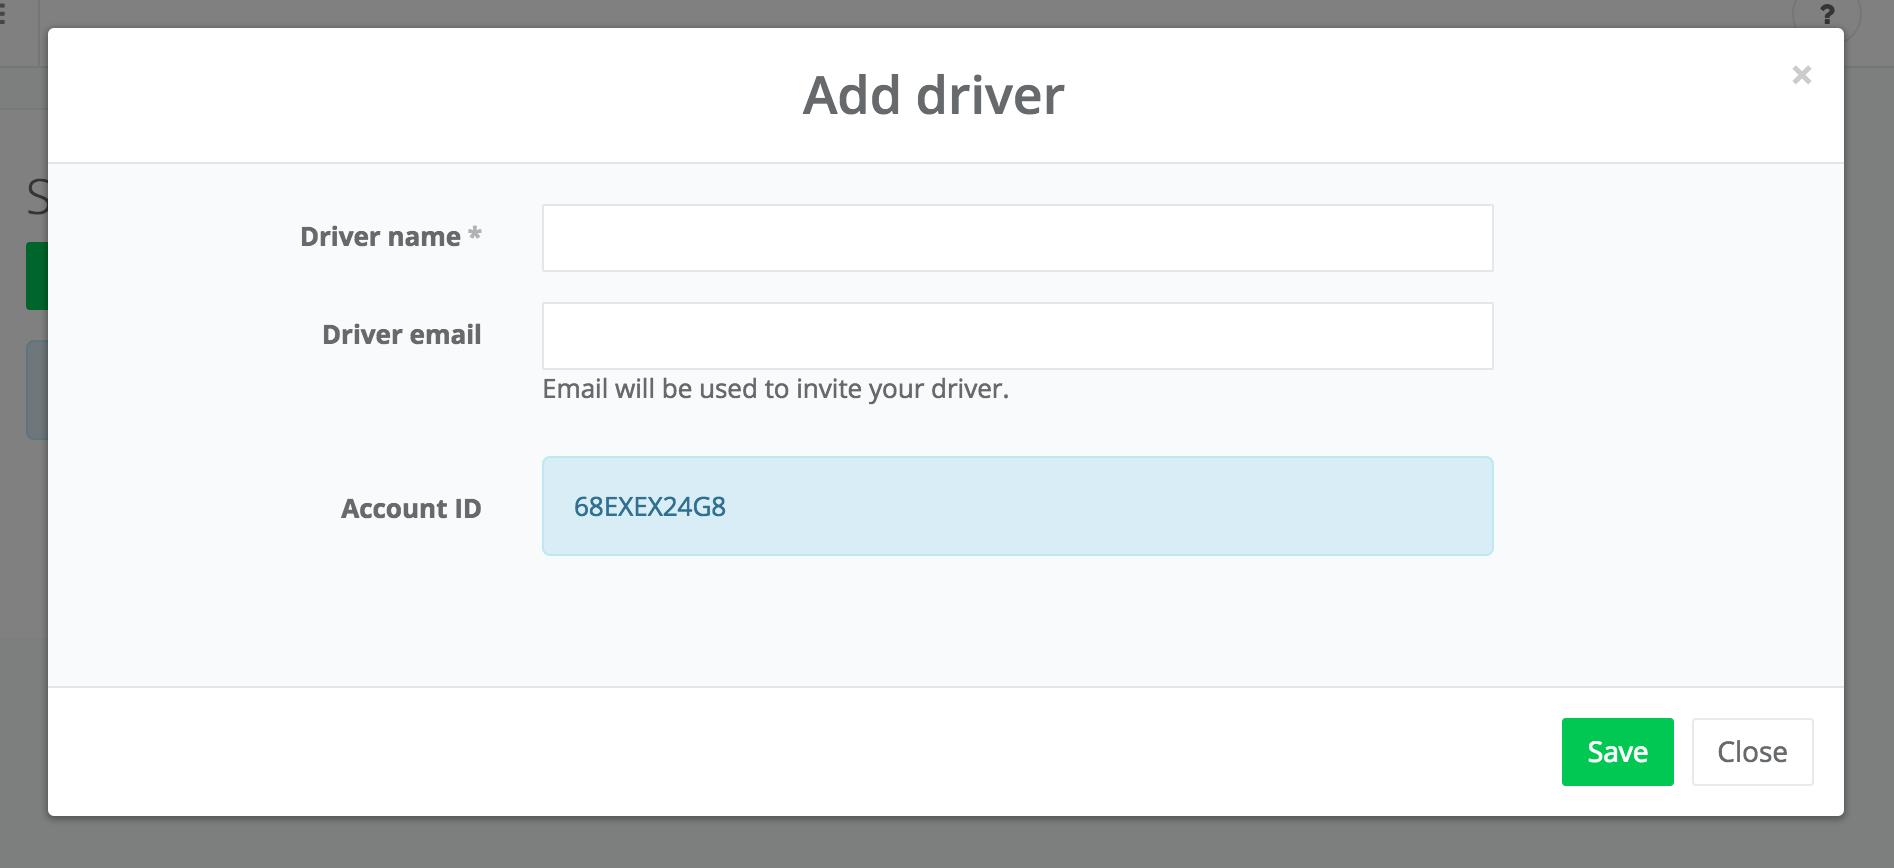 add driver form